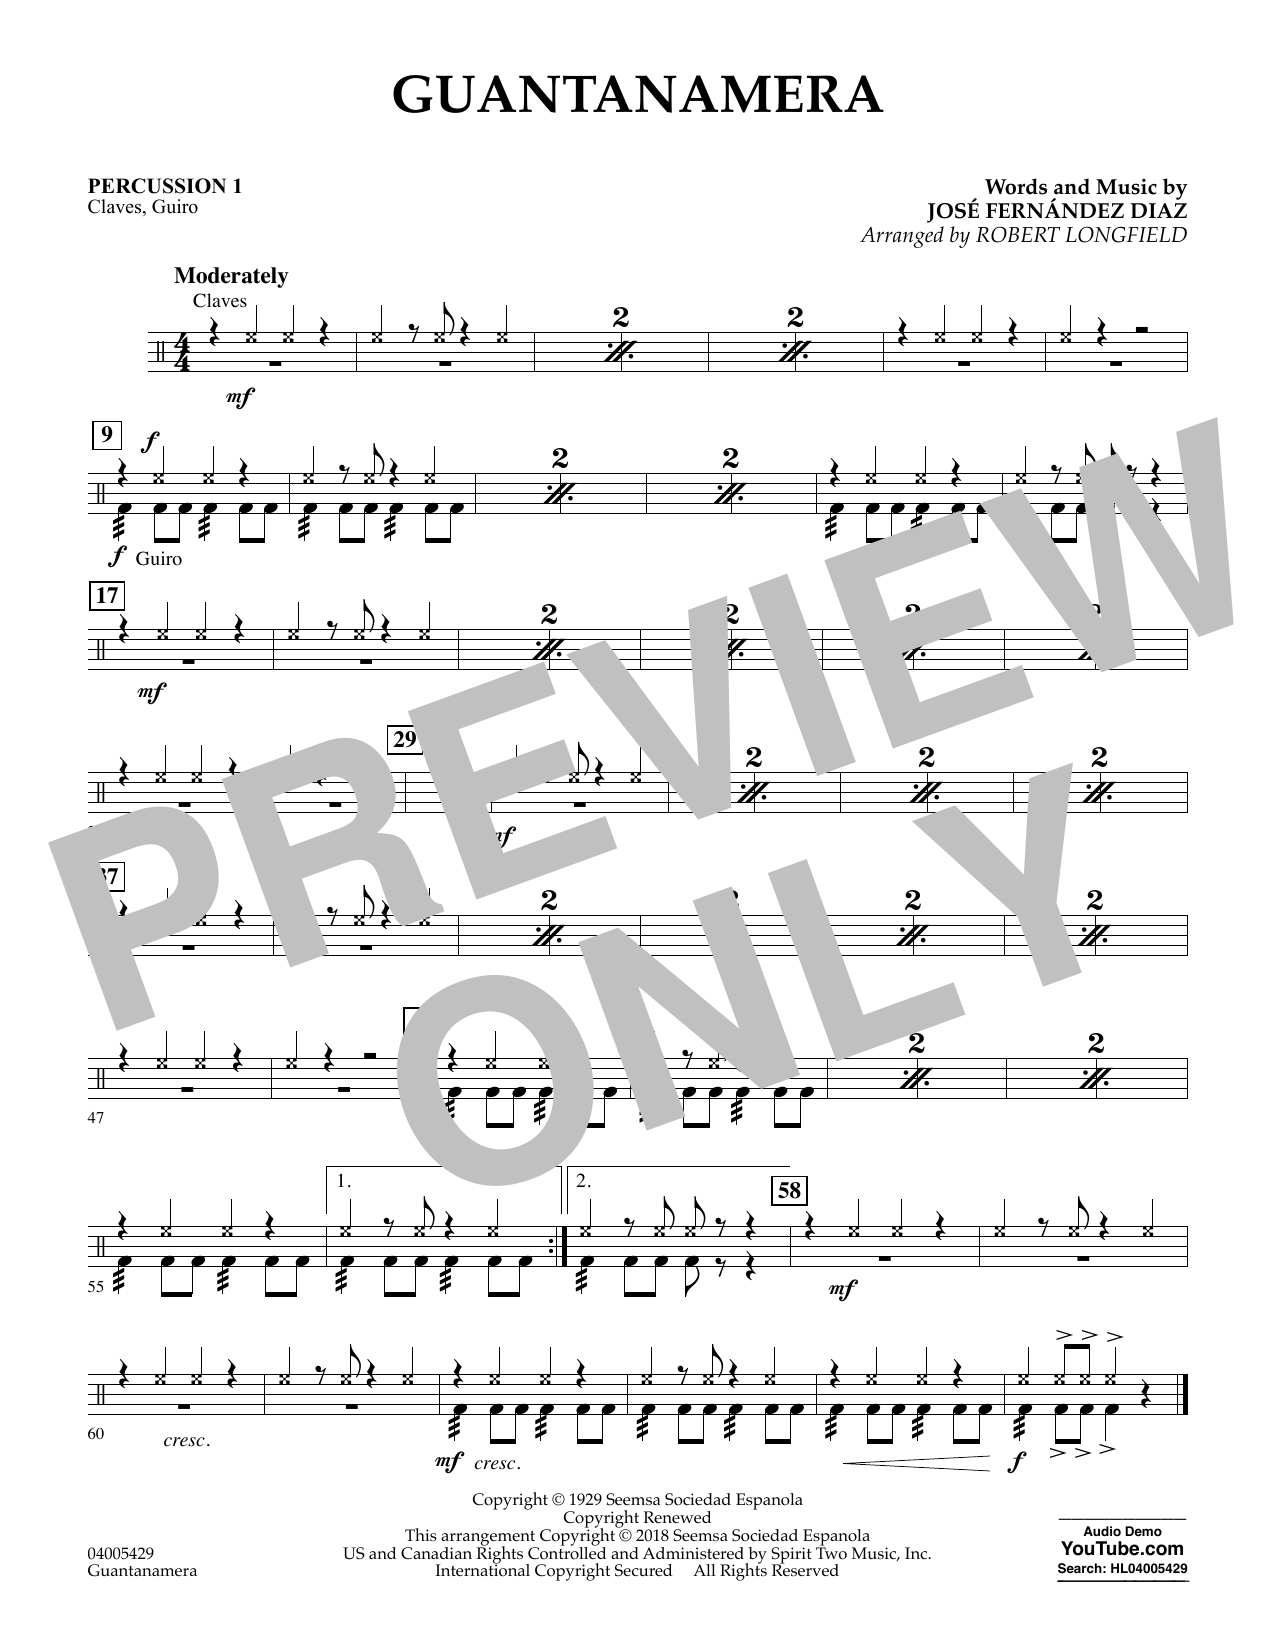 Guantanamera - Percussion 1 (Concert Band)